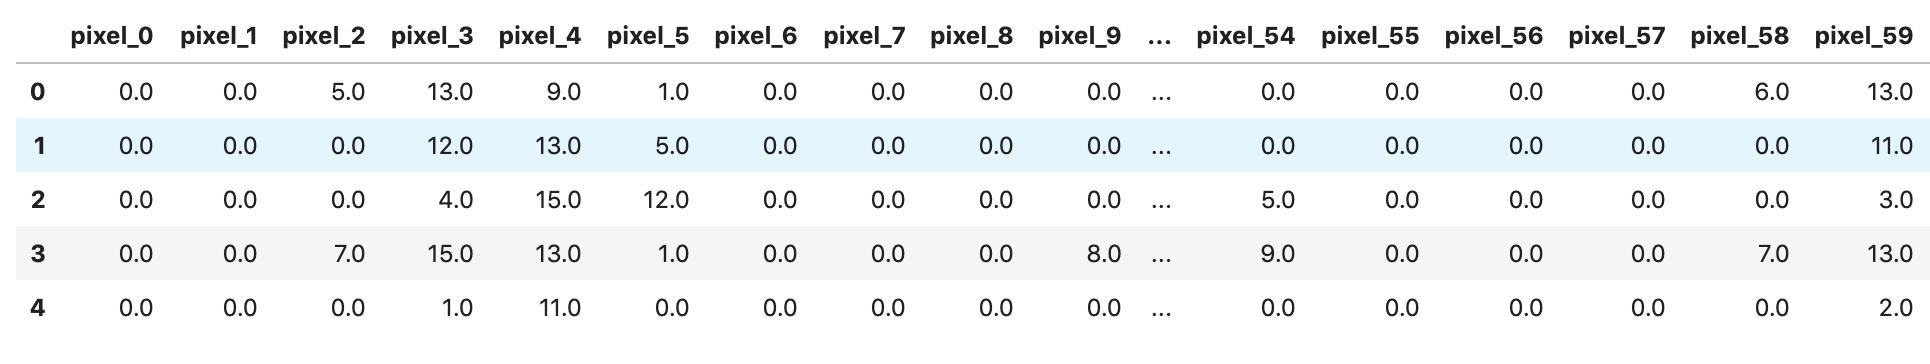 digits predict dataset